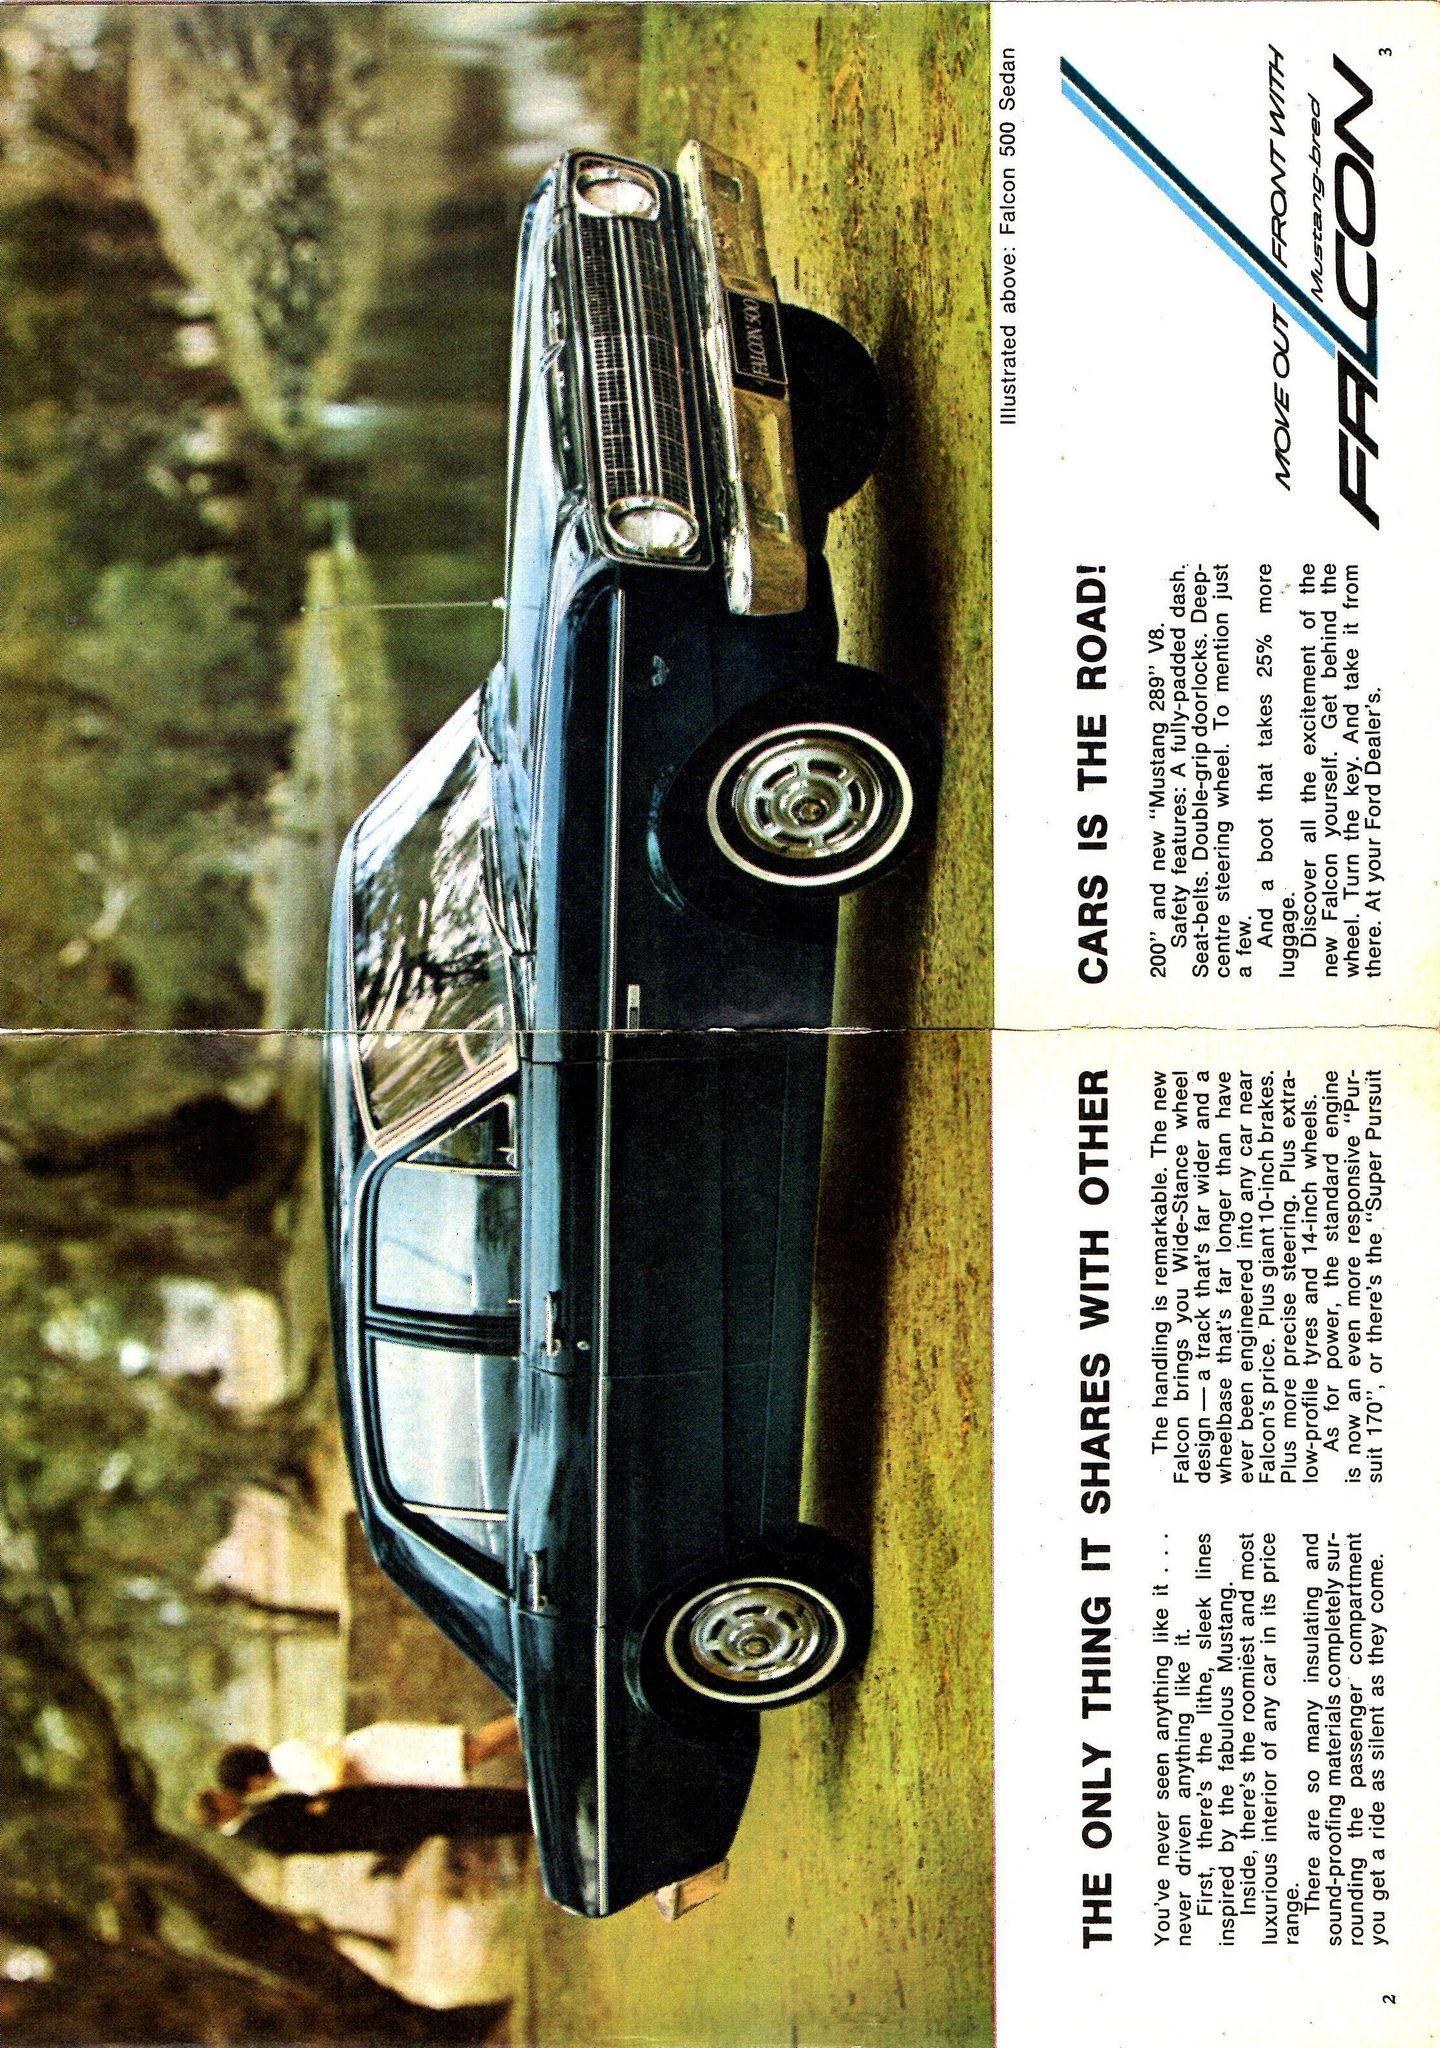 1967 Xr Ford Falcon 500 Page 1 2 Aussie Original Magazine